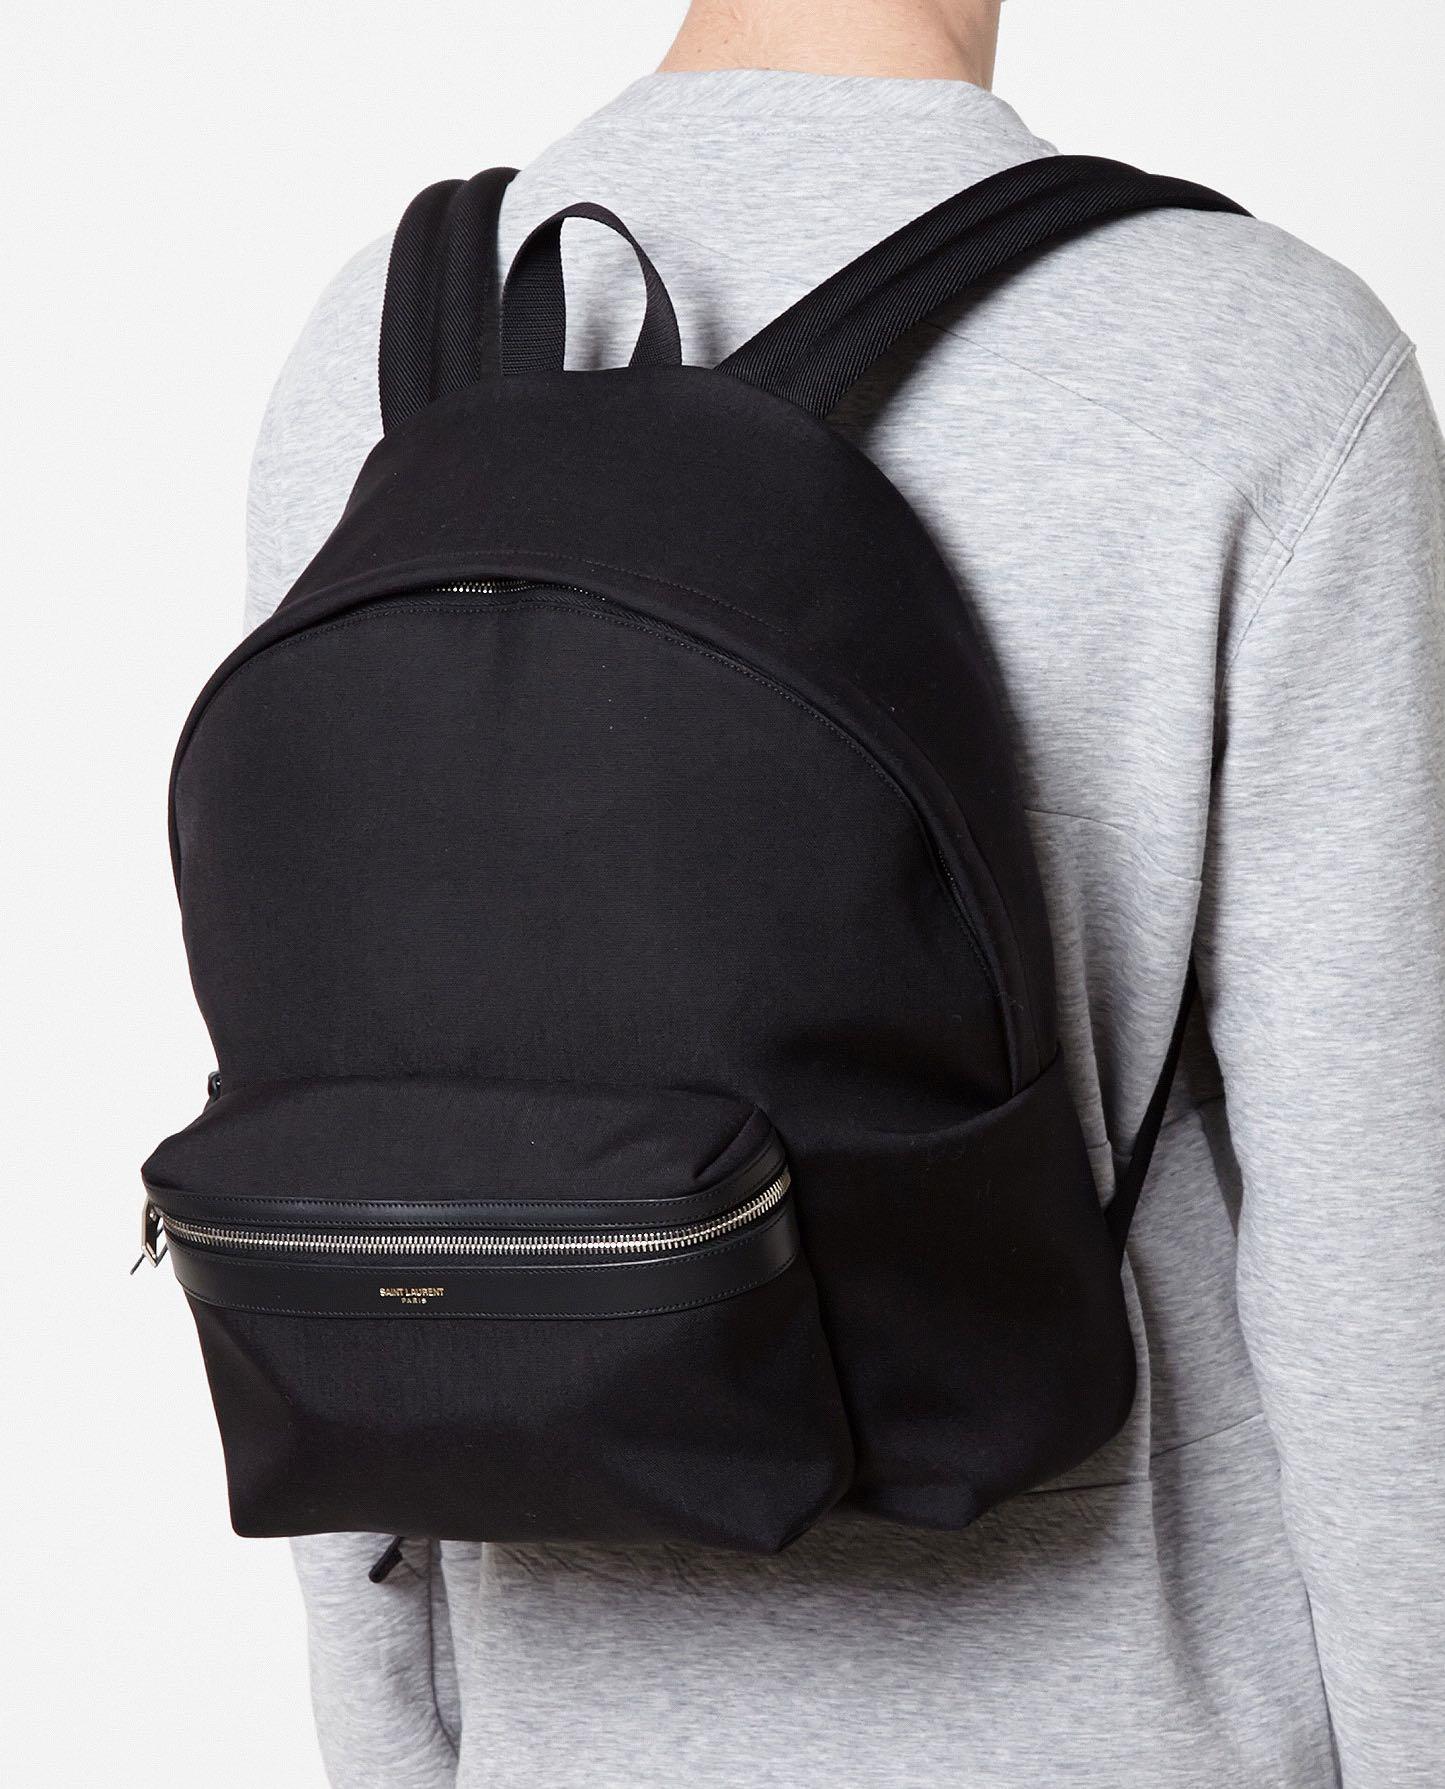 1c5c9ff1e57 Mens backpack saint laurent backpack Ysl Bag, Men's Fashion, Bags & Wallets  on Carousell